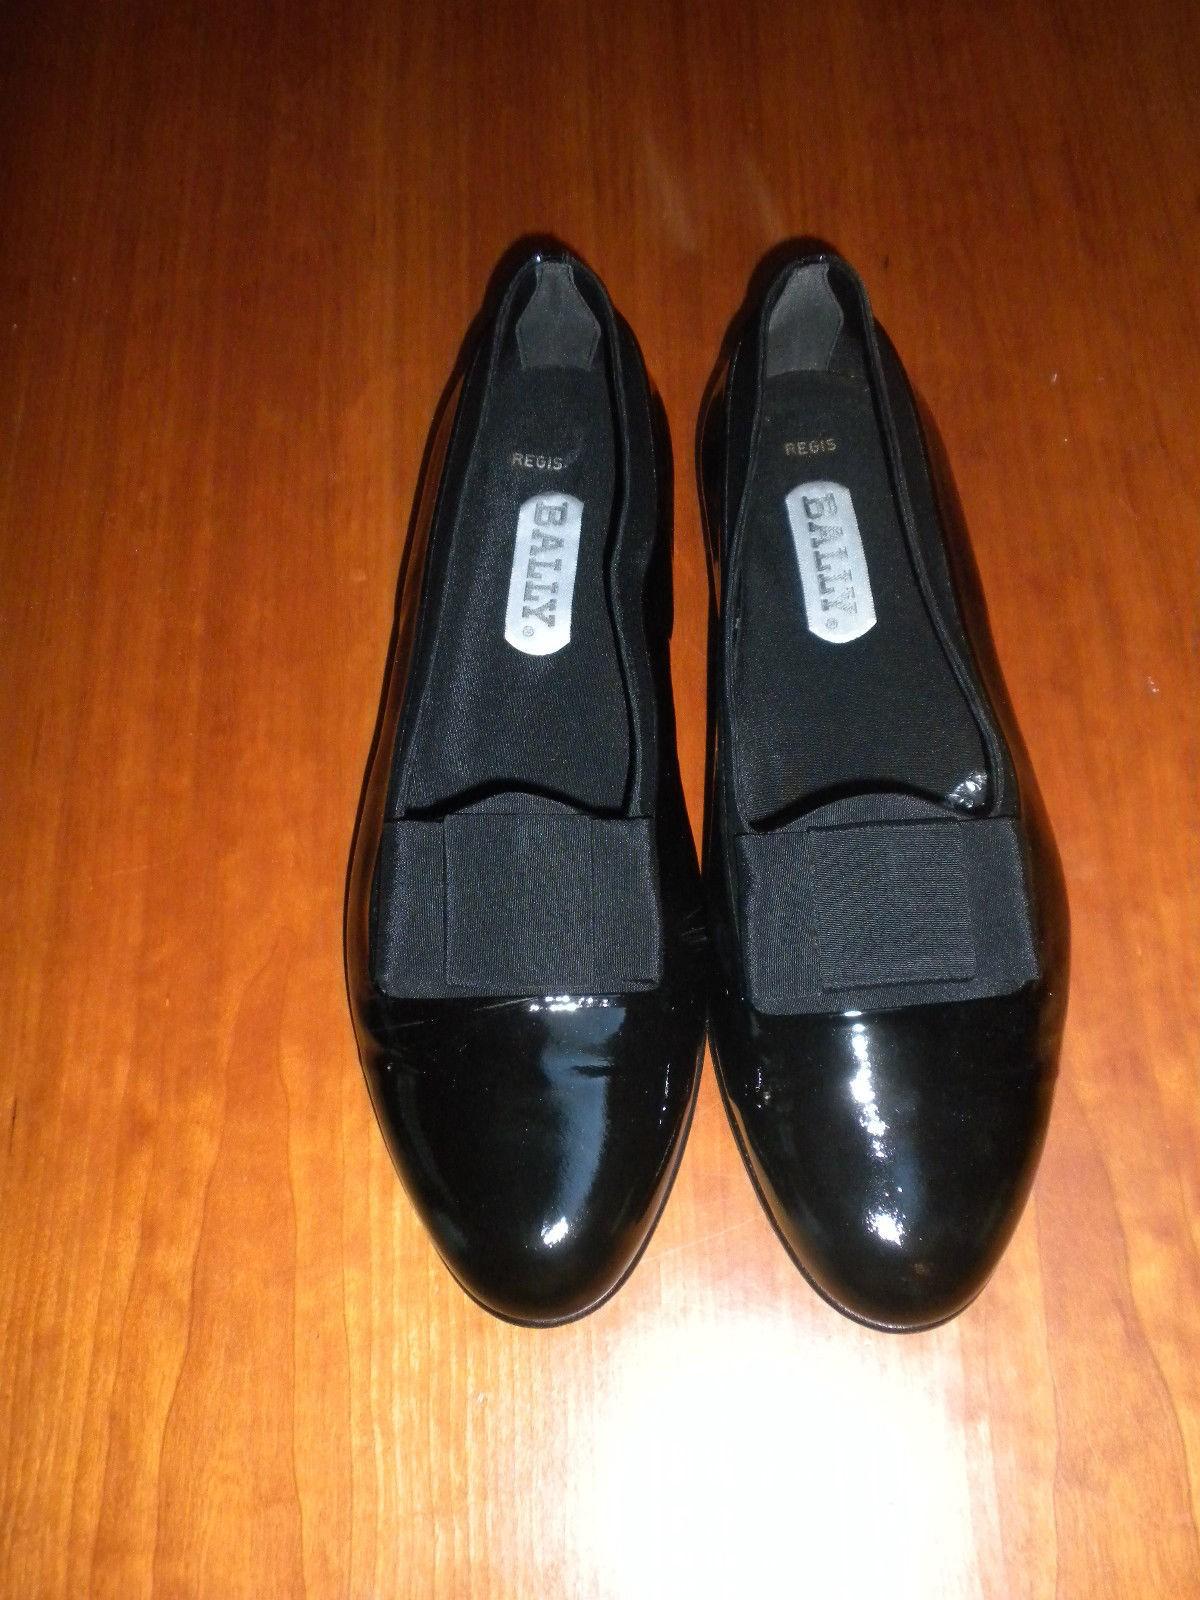 ebee15bee8c WANTED court shoes - opera pumps. Size 10-11 US  9-10 UK  43-44 EU ...